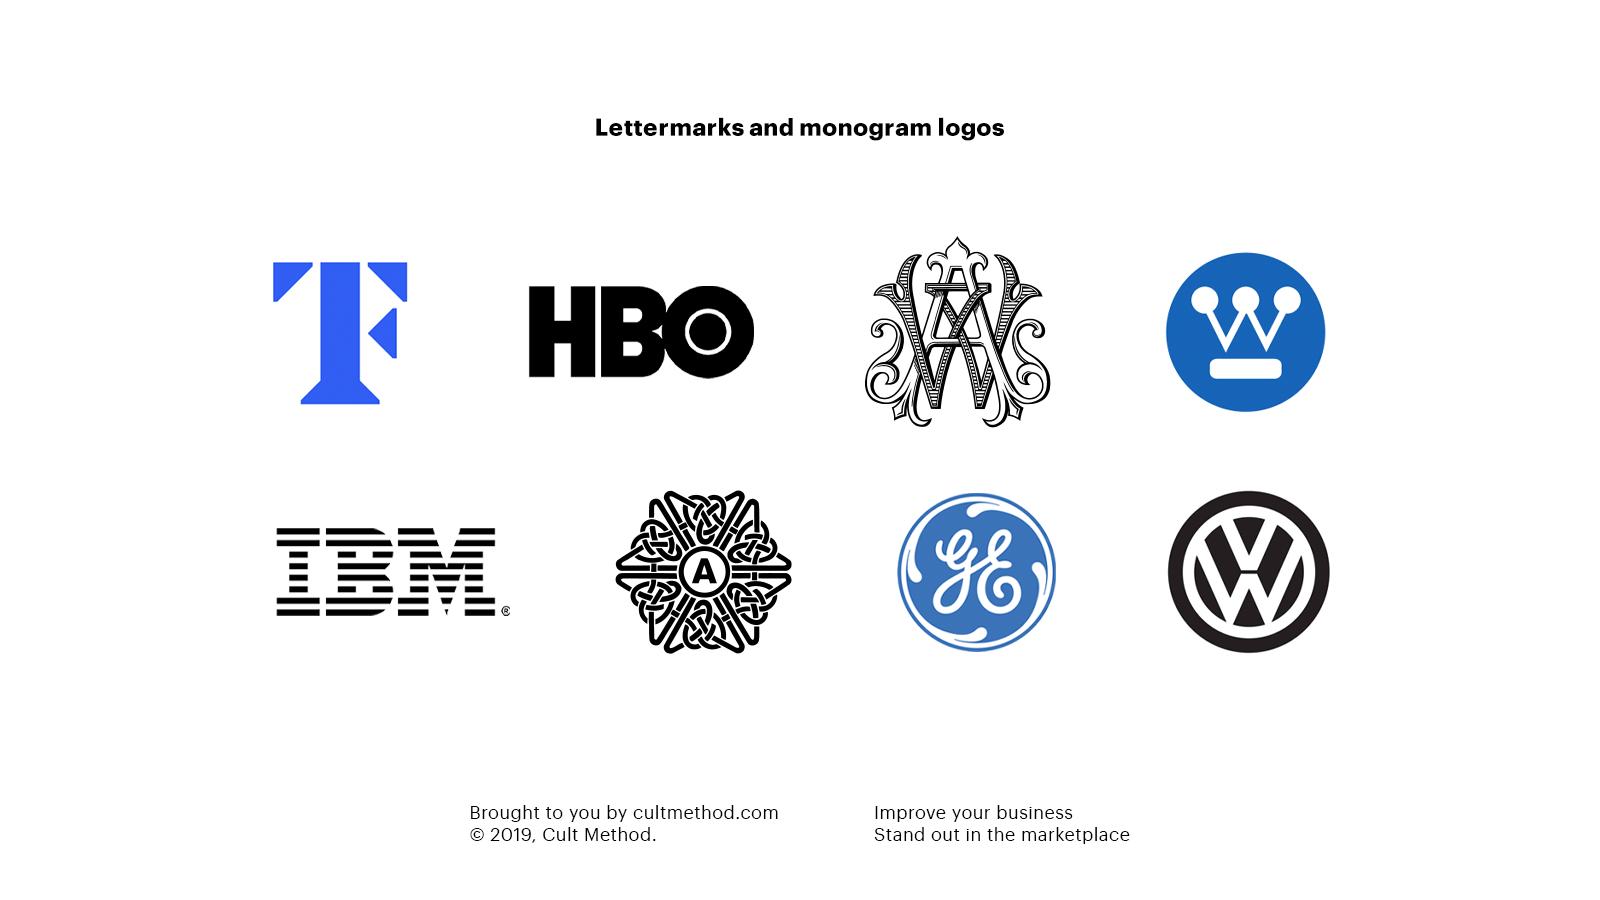 Different lettermarks and monogram logos